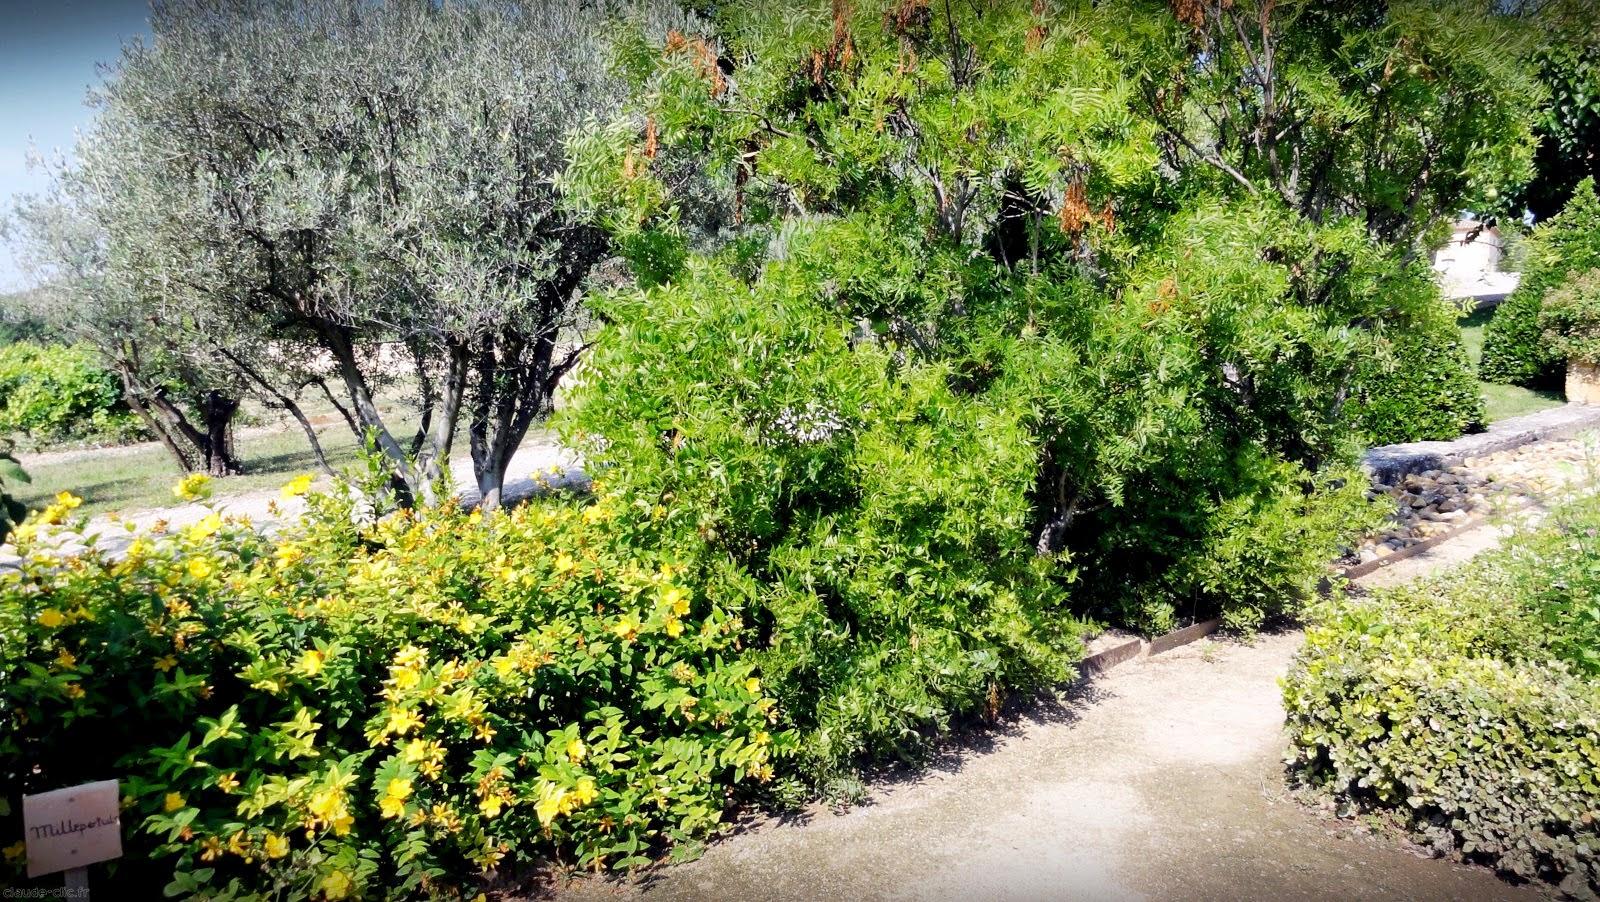 N 5 jardin de val joanis a pertuis for Entretien jardin pertuis